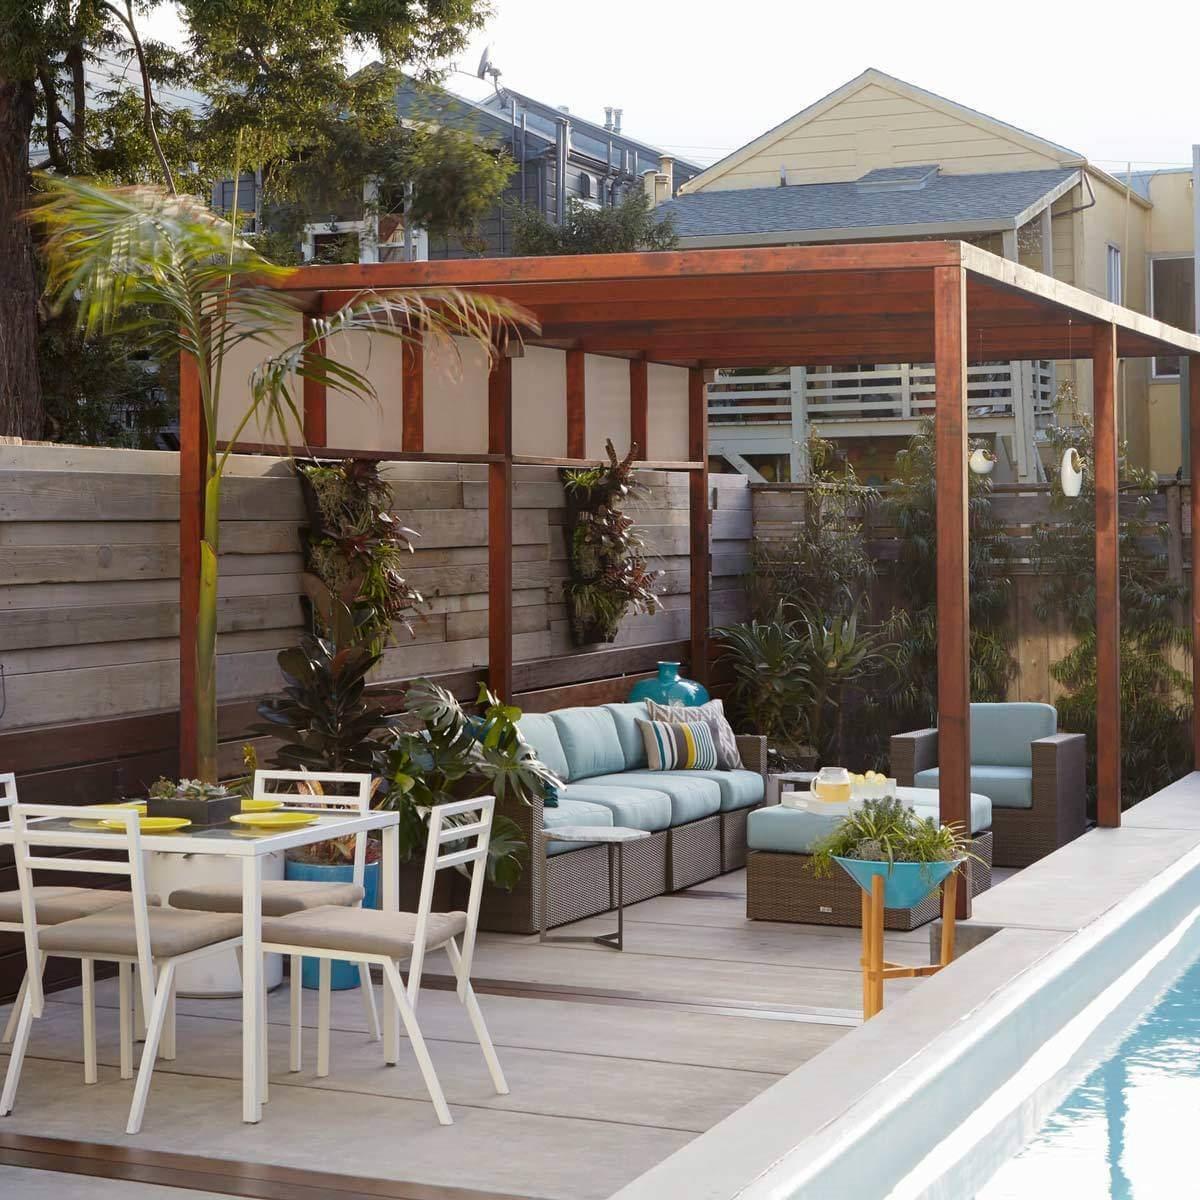 45 Backyard Patio Designs Ideas That Inspire You #Backyard